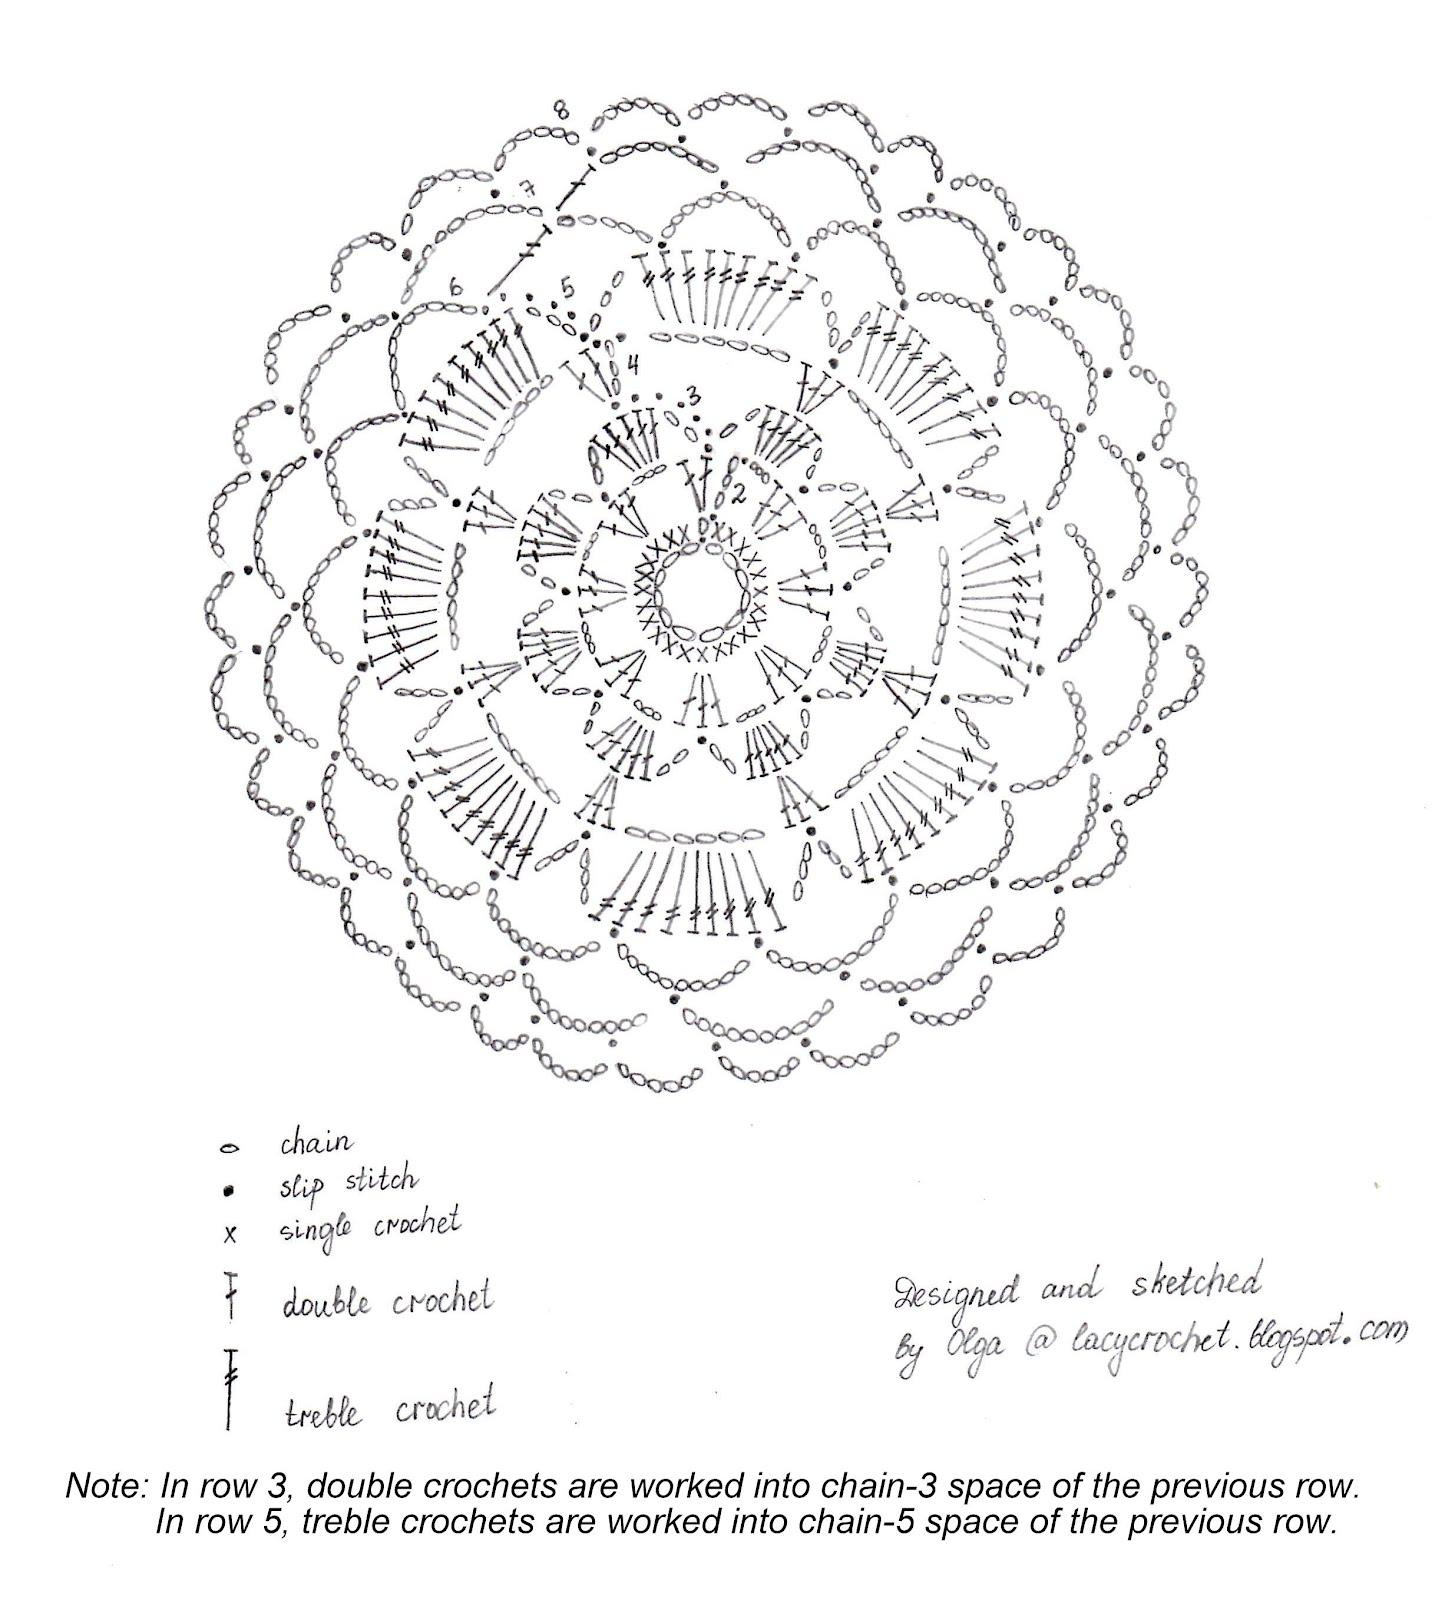 Free Crochet Doily Patterns Charts : Lacy Crochet: Mini Doily (Coaster) Symbol Chart